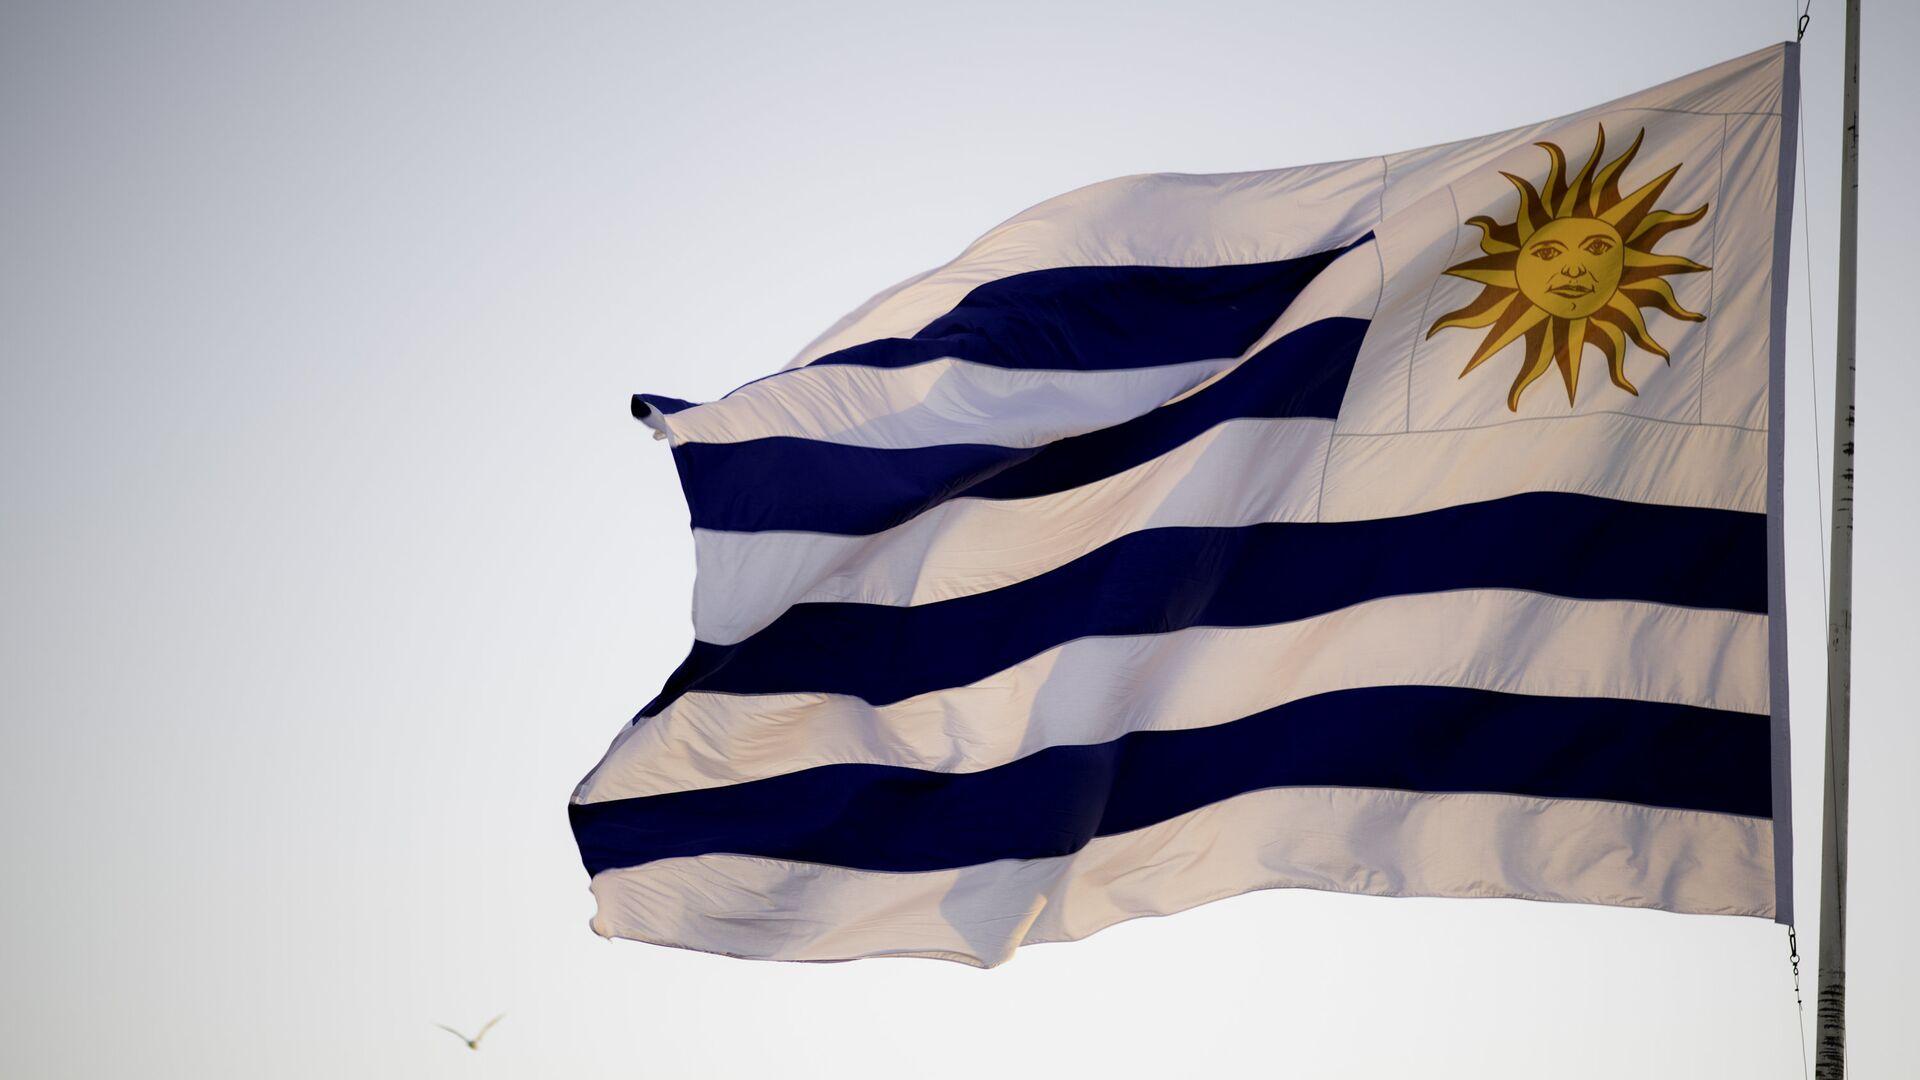 Bandera de Uruguay - Sputnik Mundo, 1920, 11.03.2021